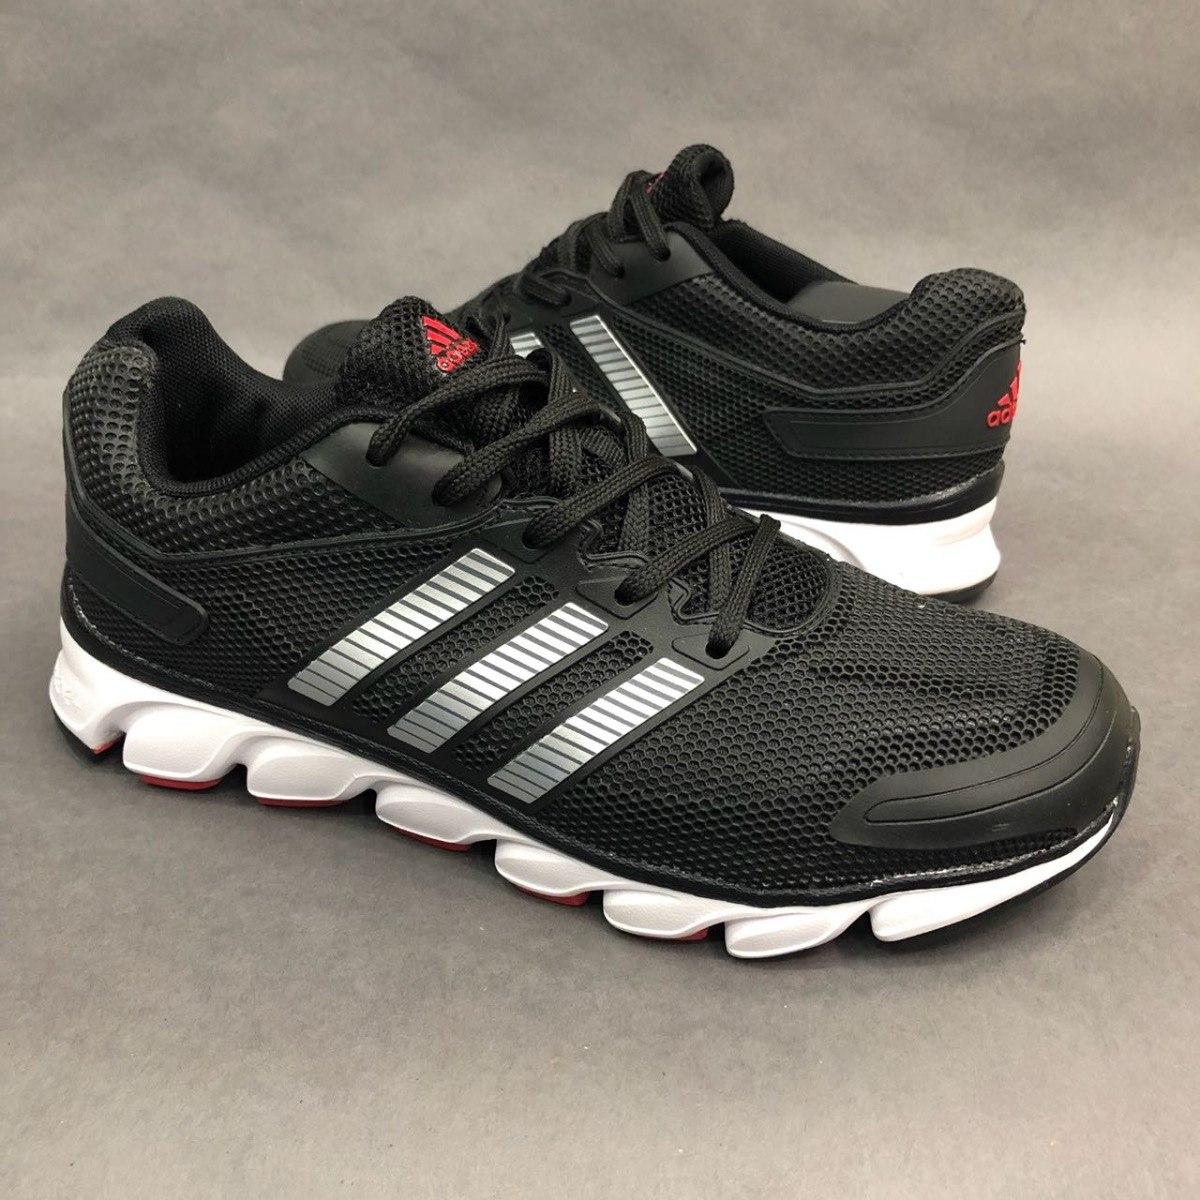 best cheap e3a29 9cb85 ... discount tenis zapatillas adidas climacool ride negra blanca hombre.  cargando zoom. d13c4 2c40a